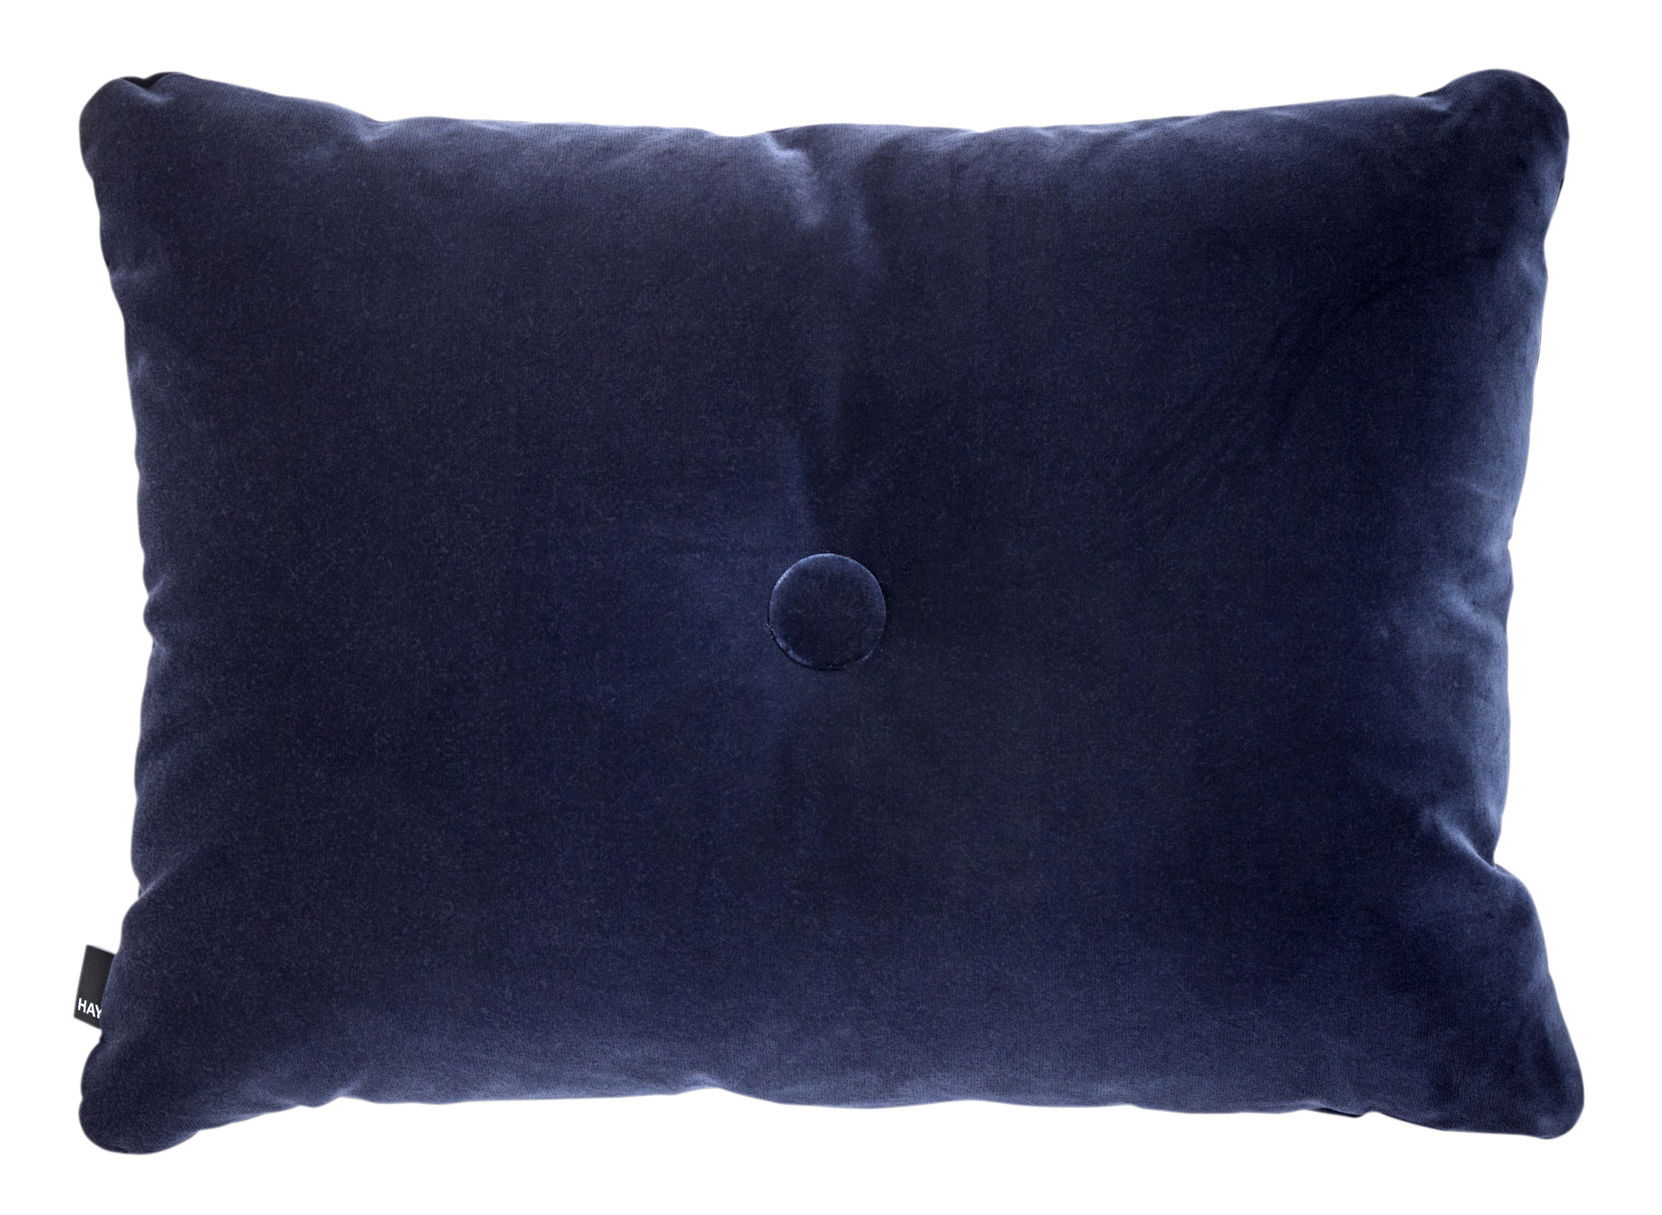 Interni - Cuscini  - Cuscino Dot - Velours - / 60 x 45 cm di Hay - Blu marine - Cotone (velluto)